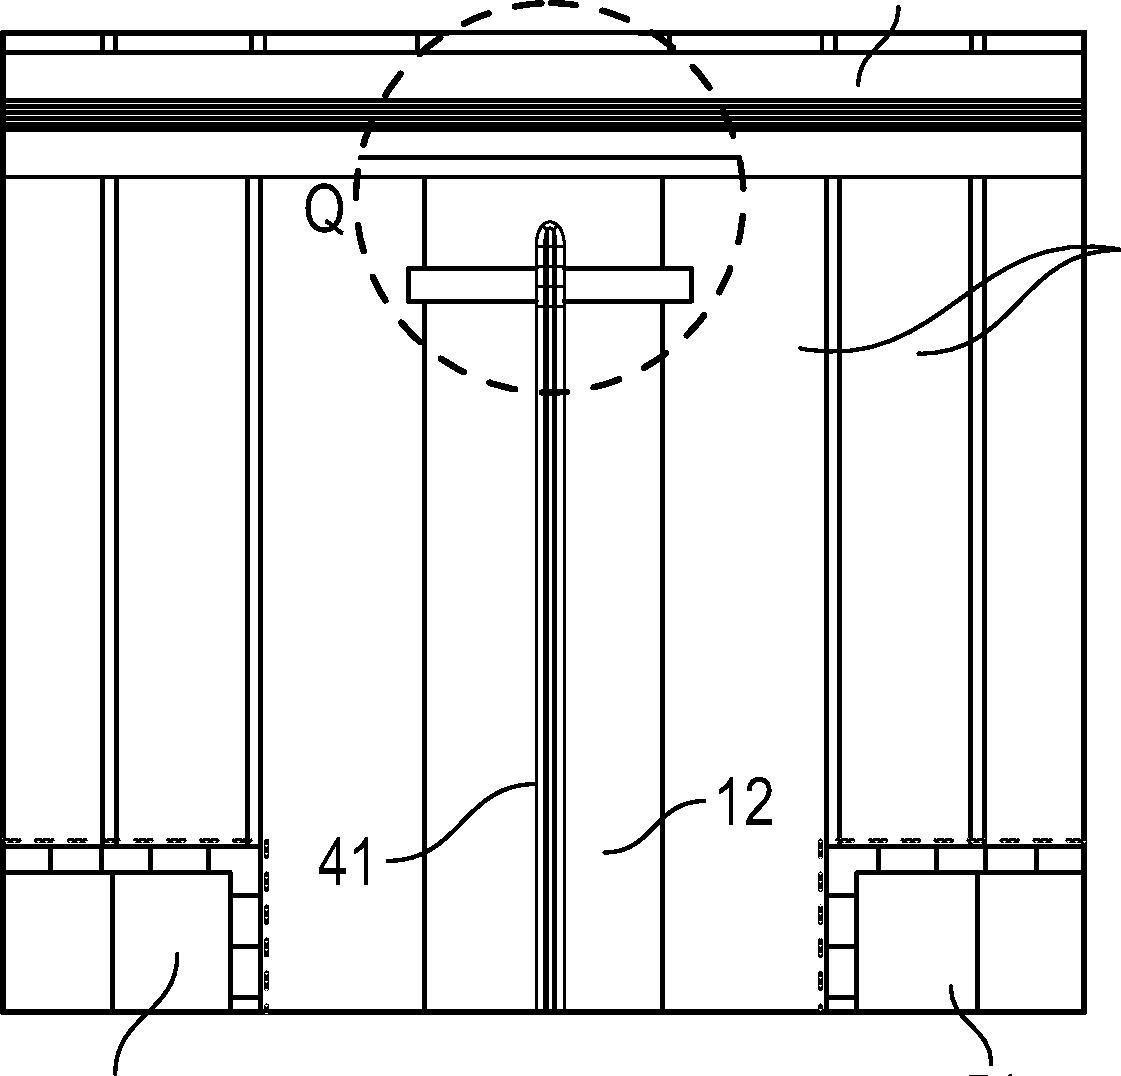 Figure GB2554862A_D0029